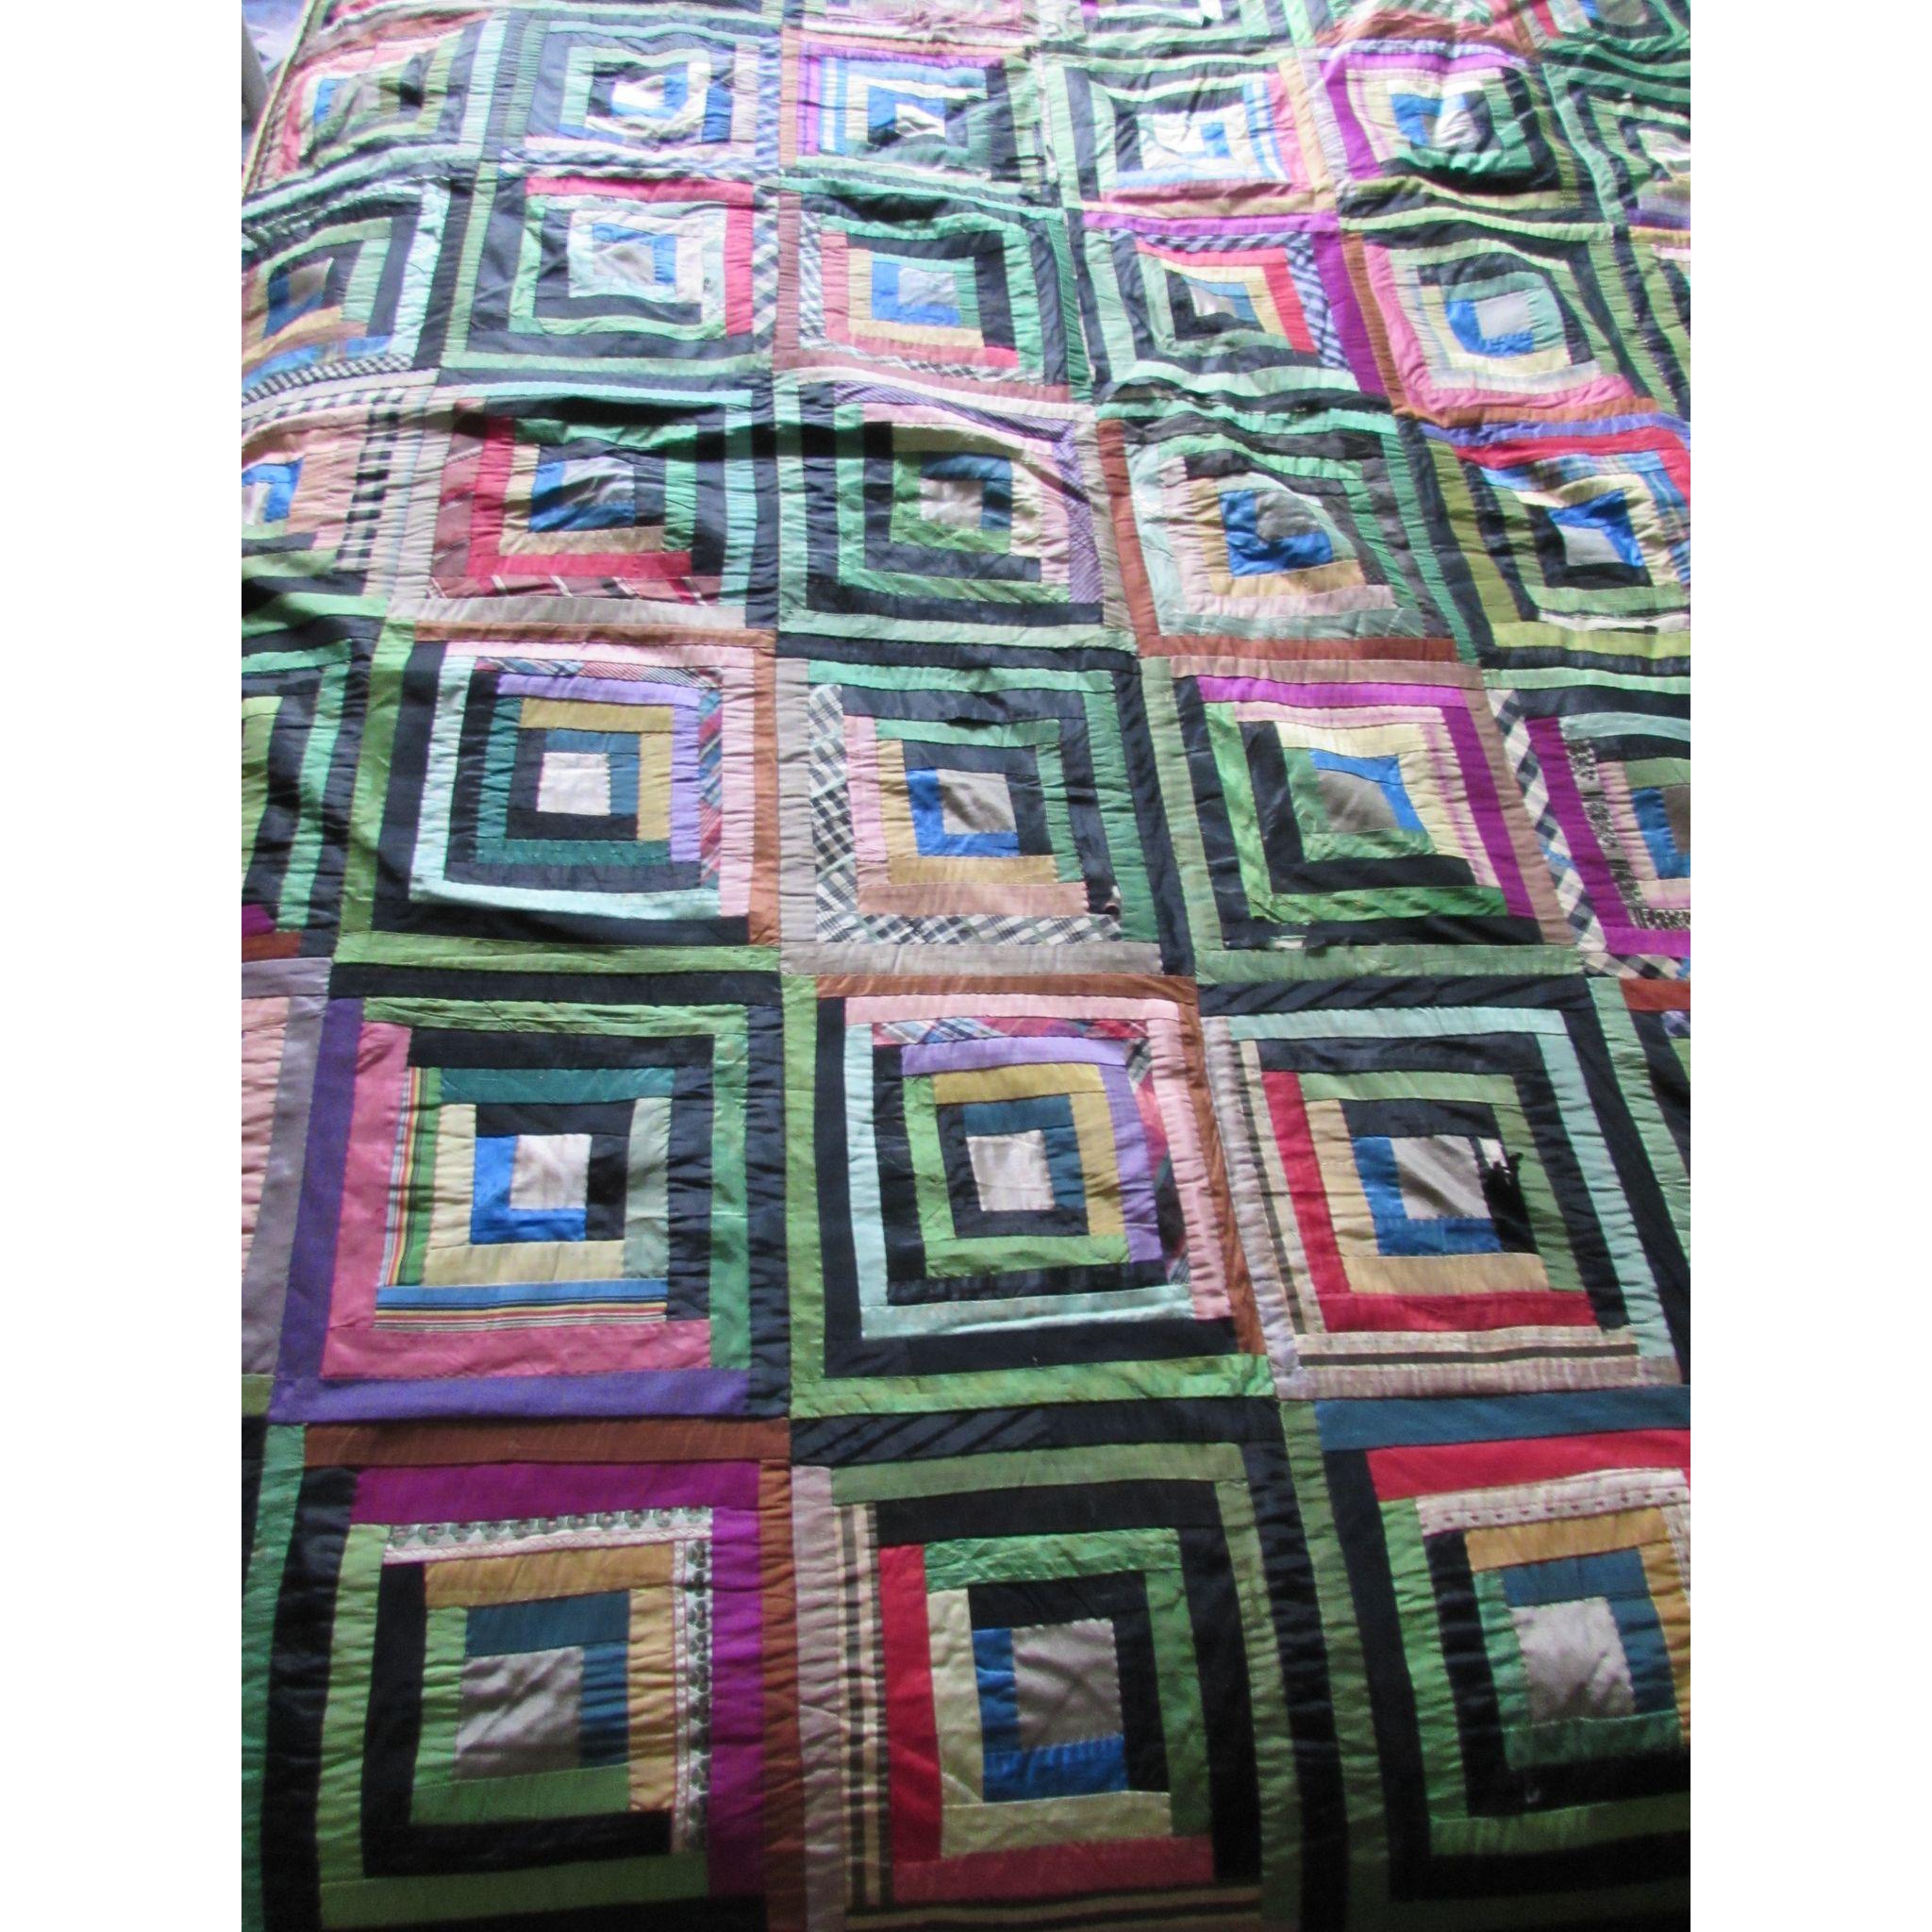 Antique Silk Crazy Quilt in Log Cabin Design Green Black Dominant